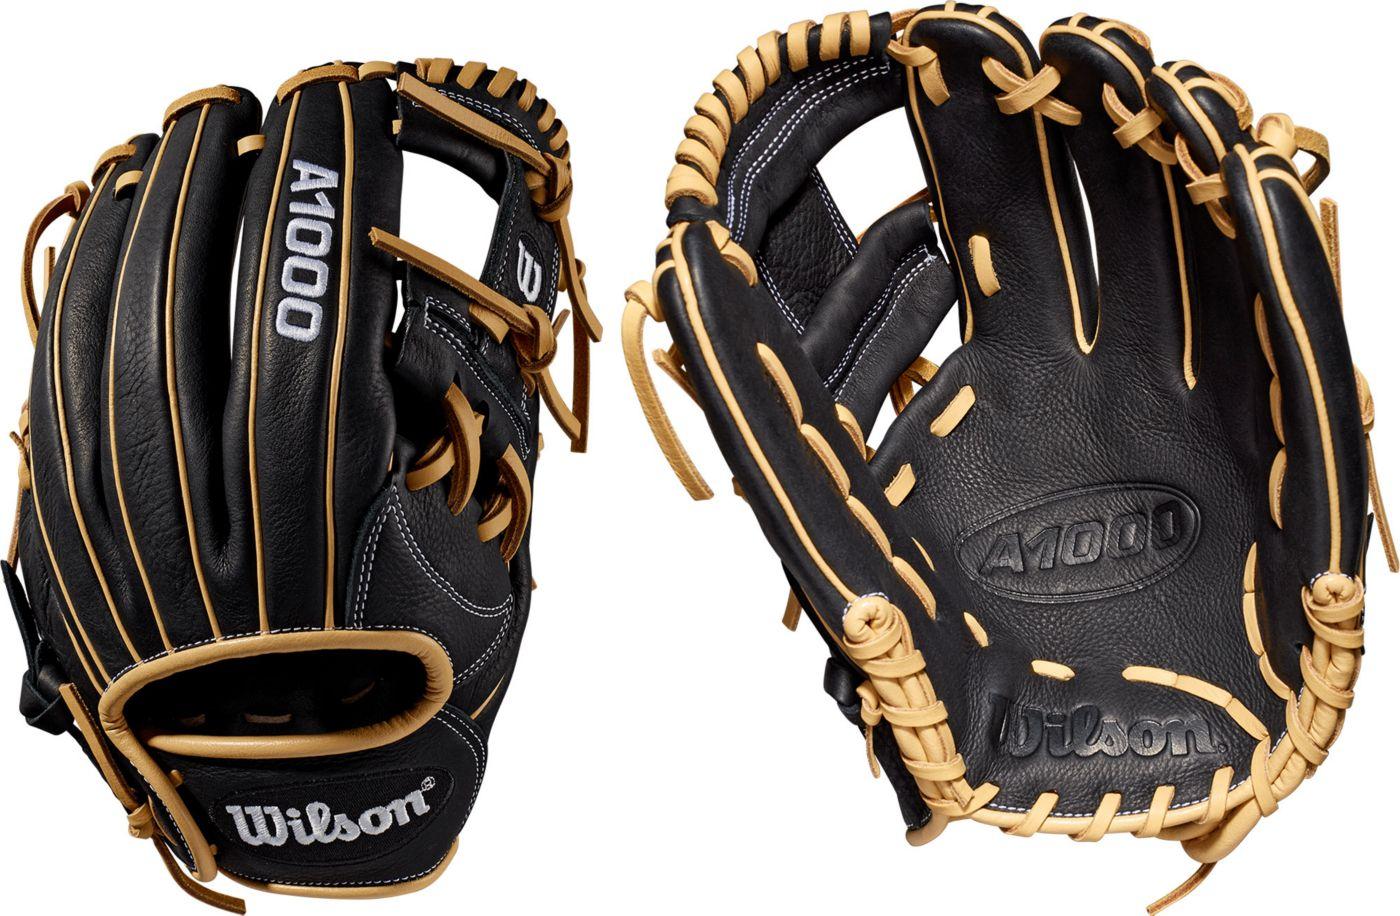 Wilson 11.75'' A1000 Series Glove